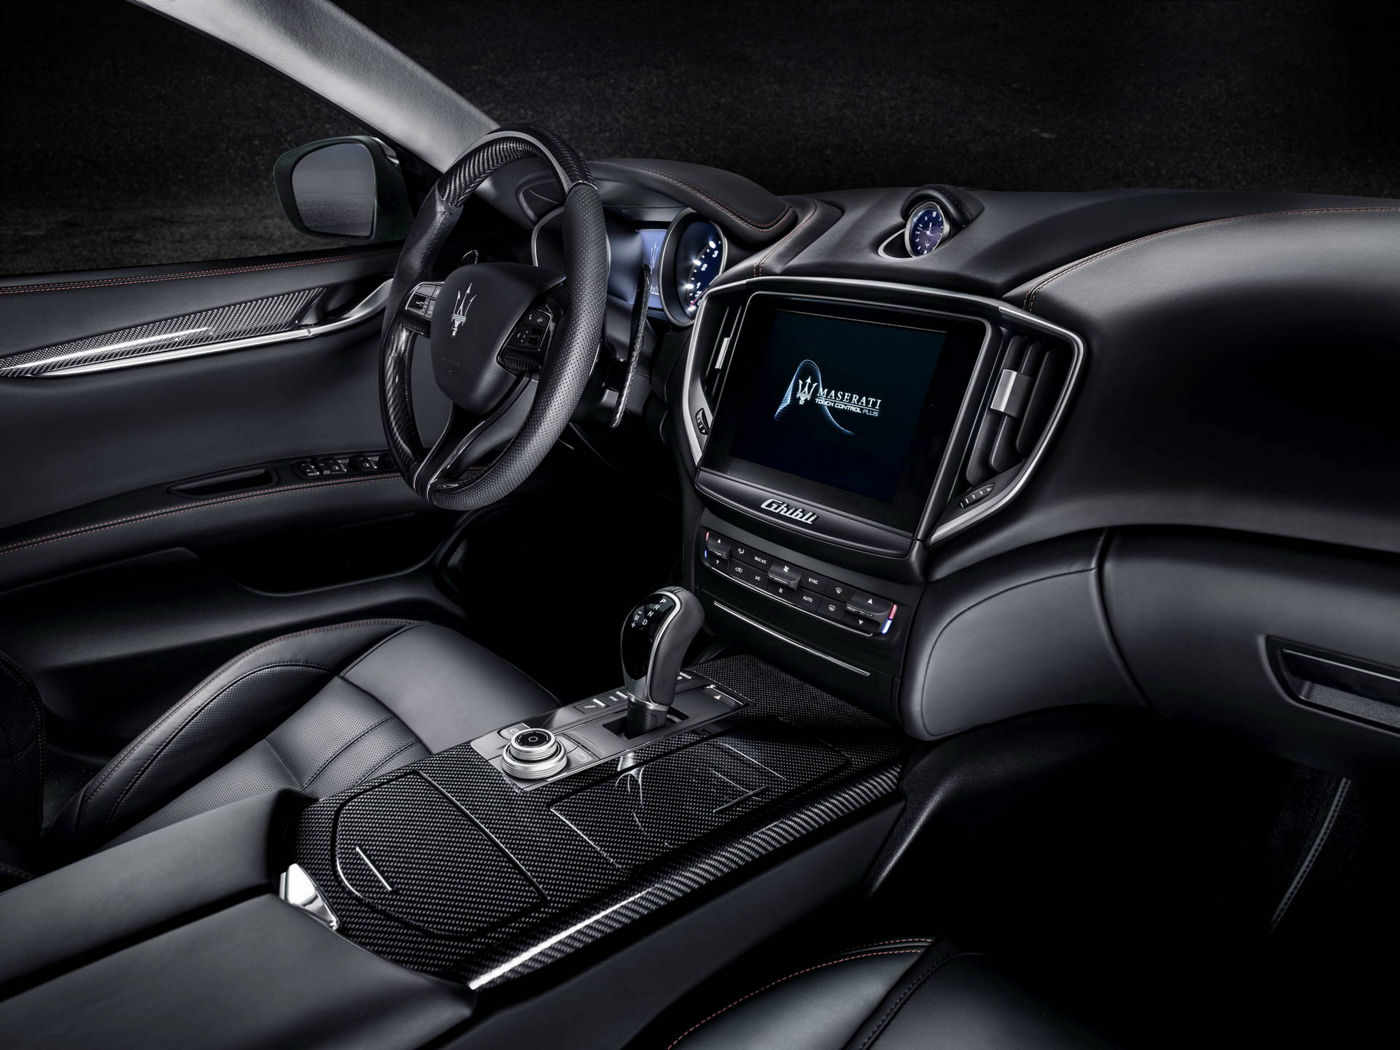 Maserati Ghibli GranSport performance sedans - dashboard and interior design details